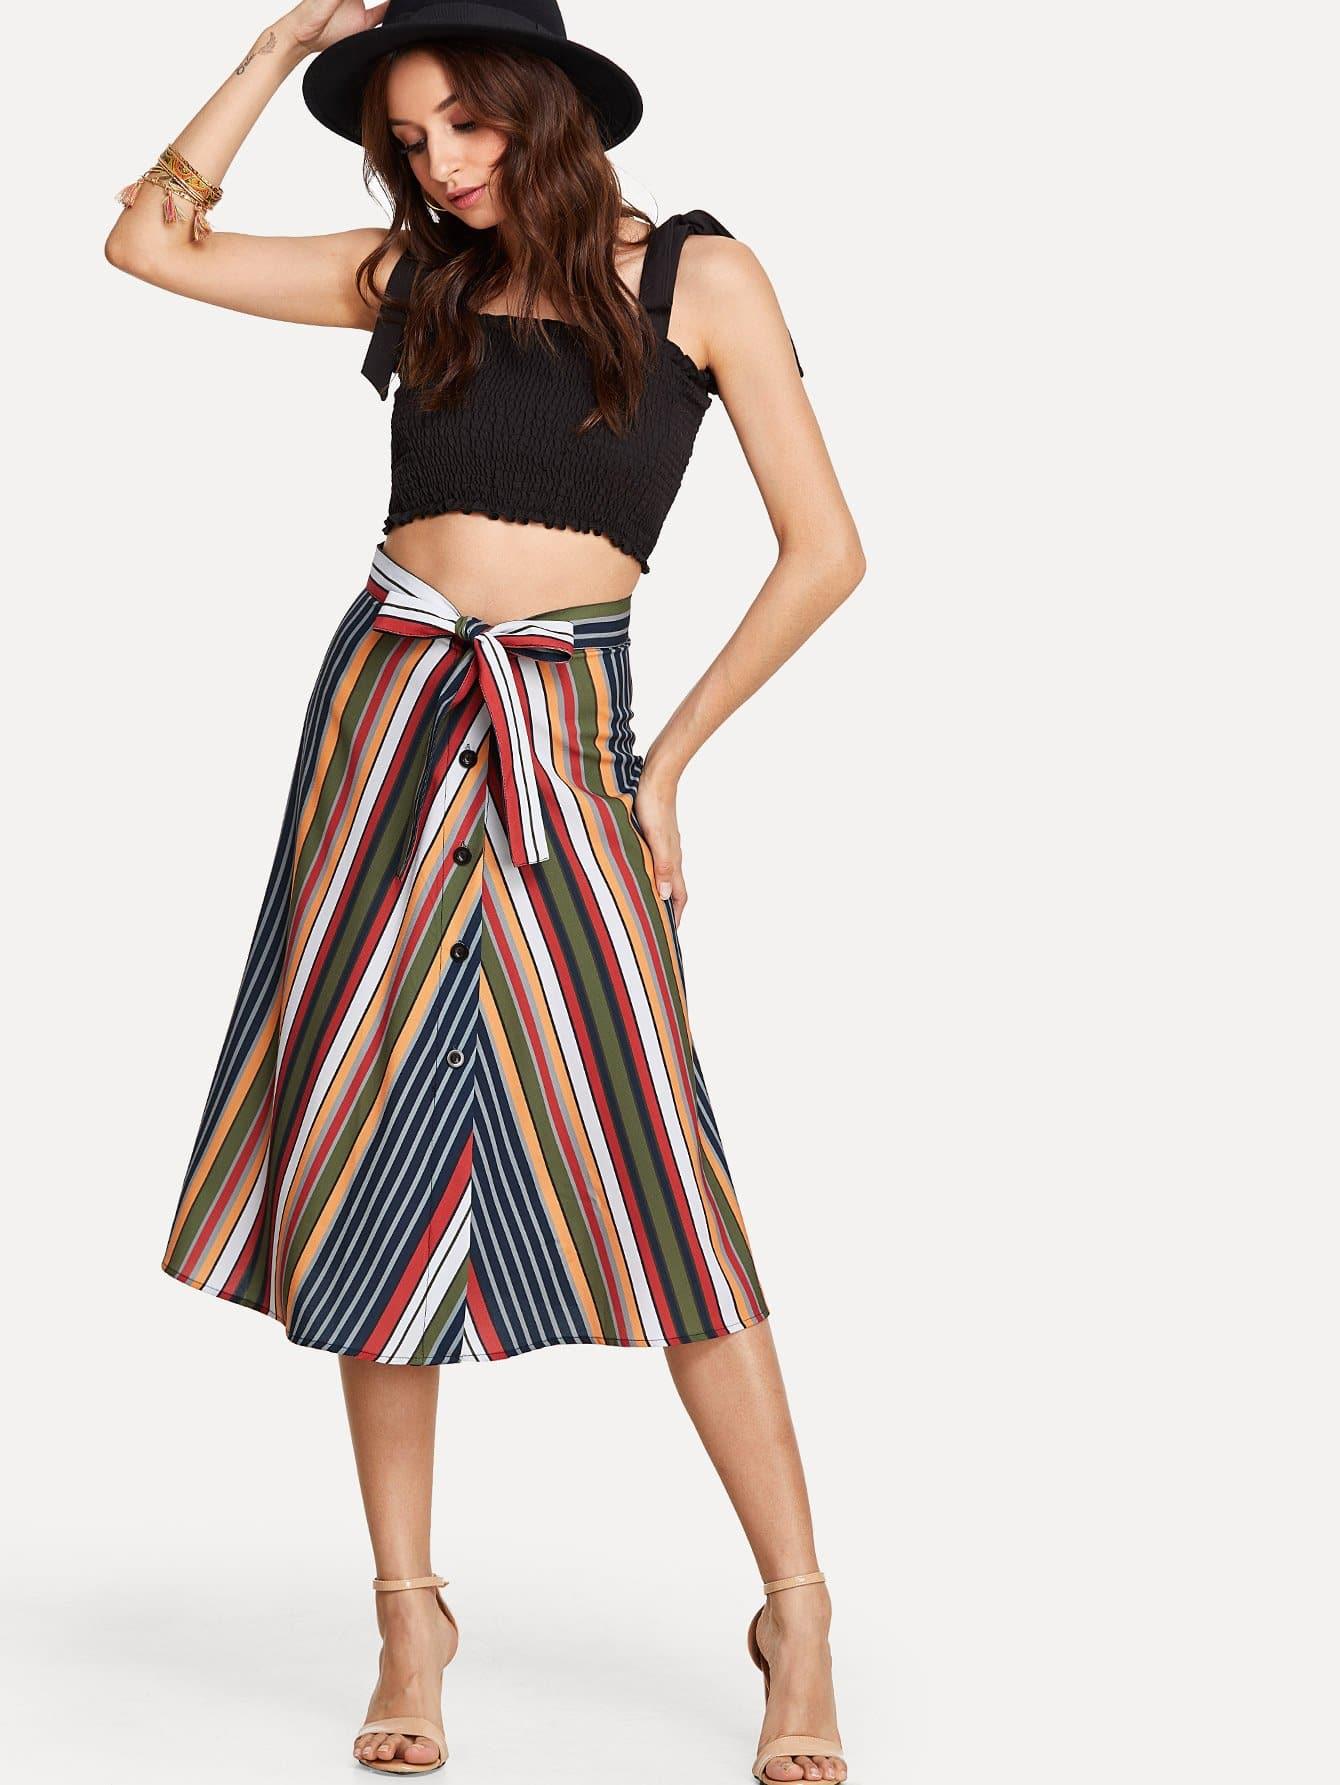 Self Tie Striped Skirt multi striped skirt